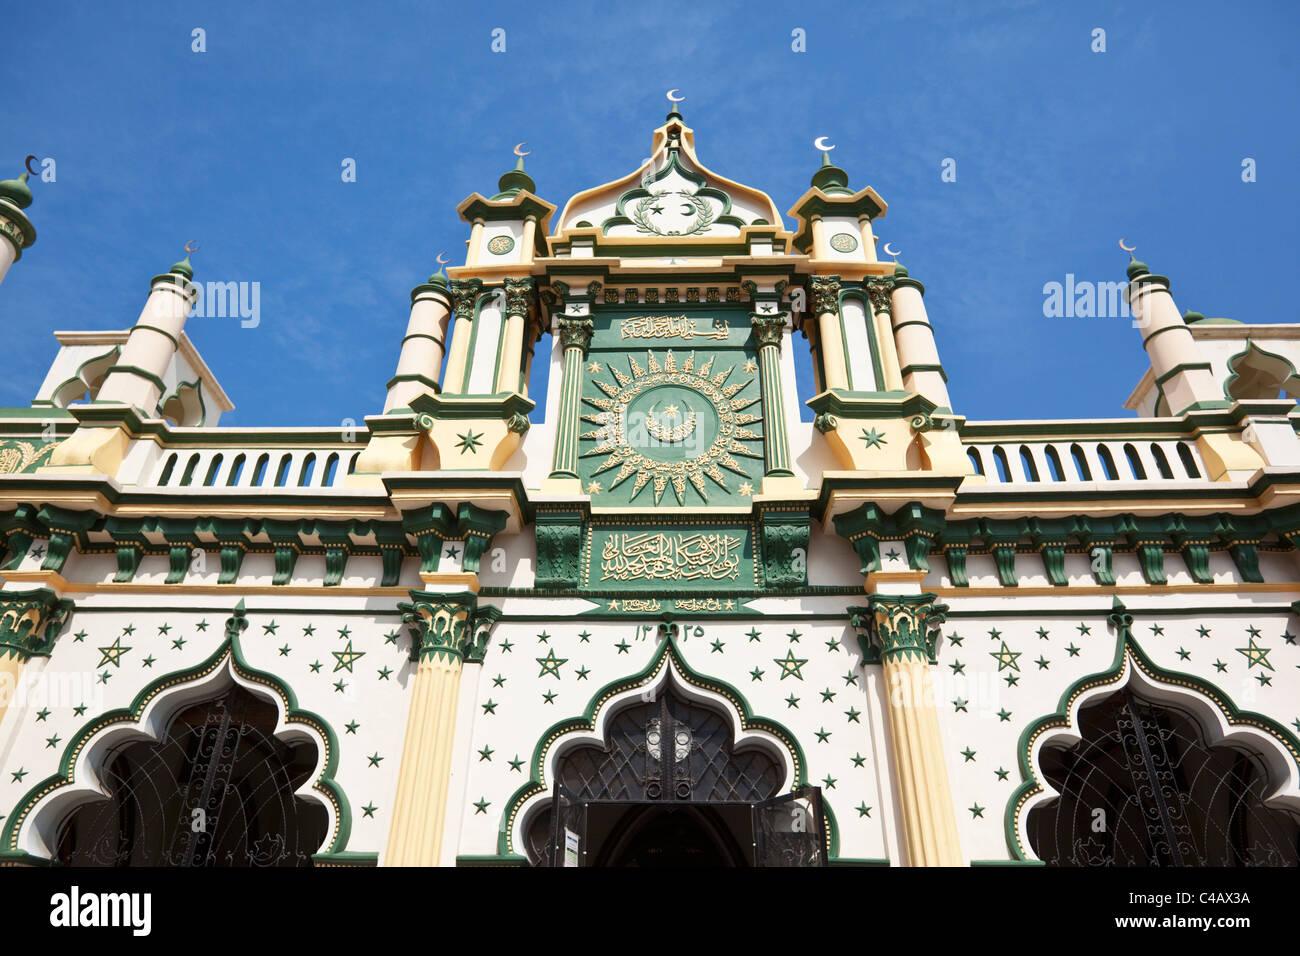 islamic architecture stock photos islamic architecture stock